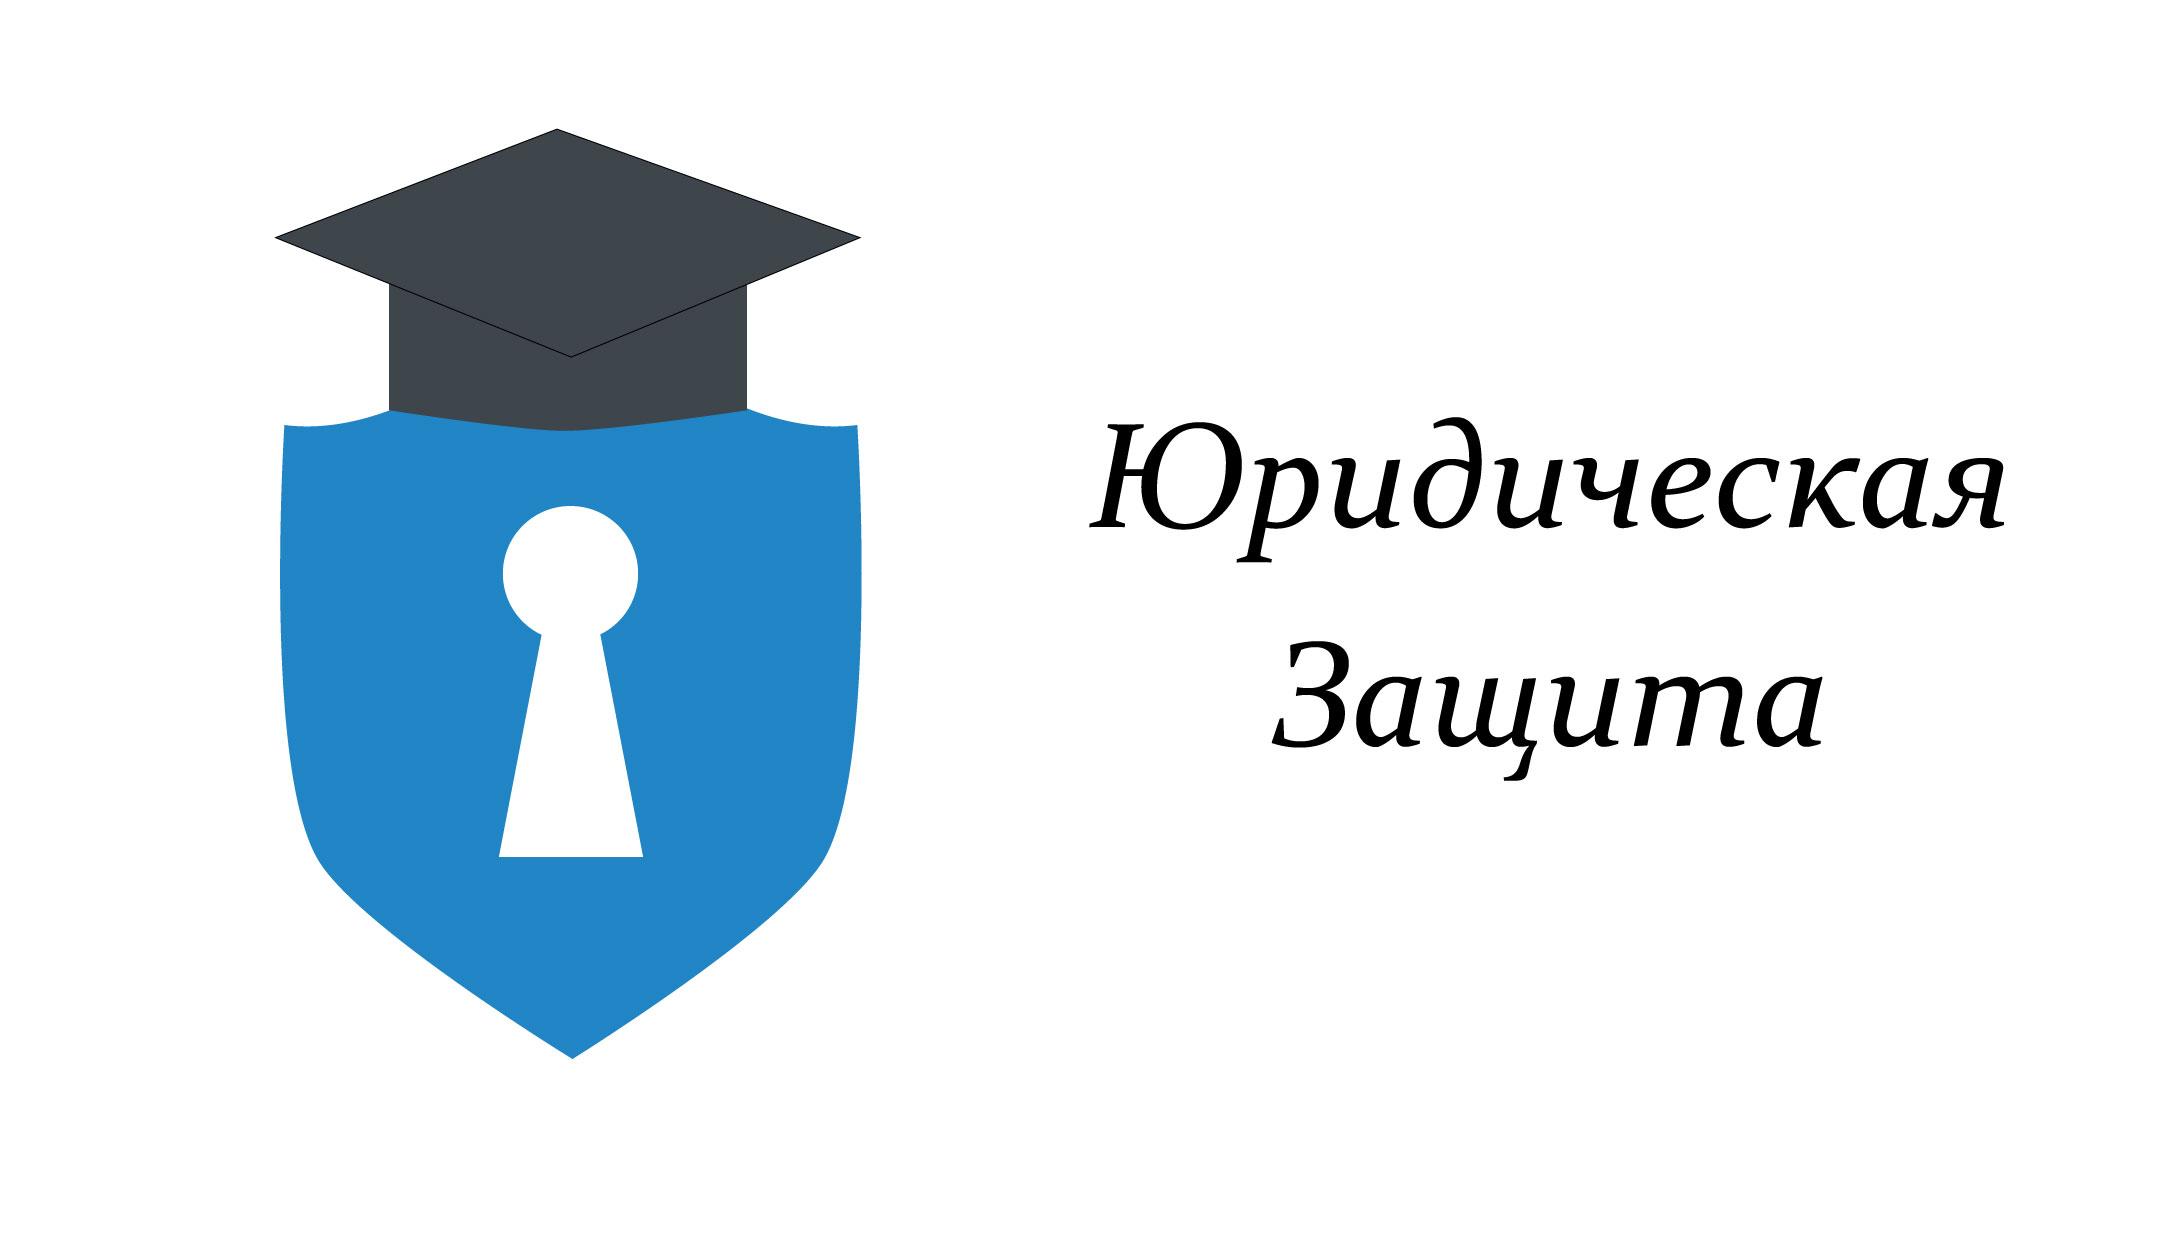 Разработка логотипа для юридической компании фото f_49855e0660257d68.jpg